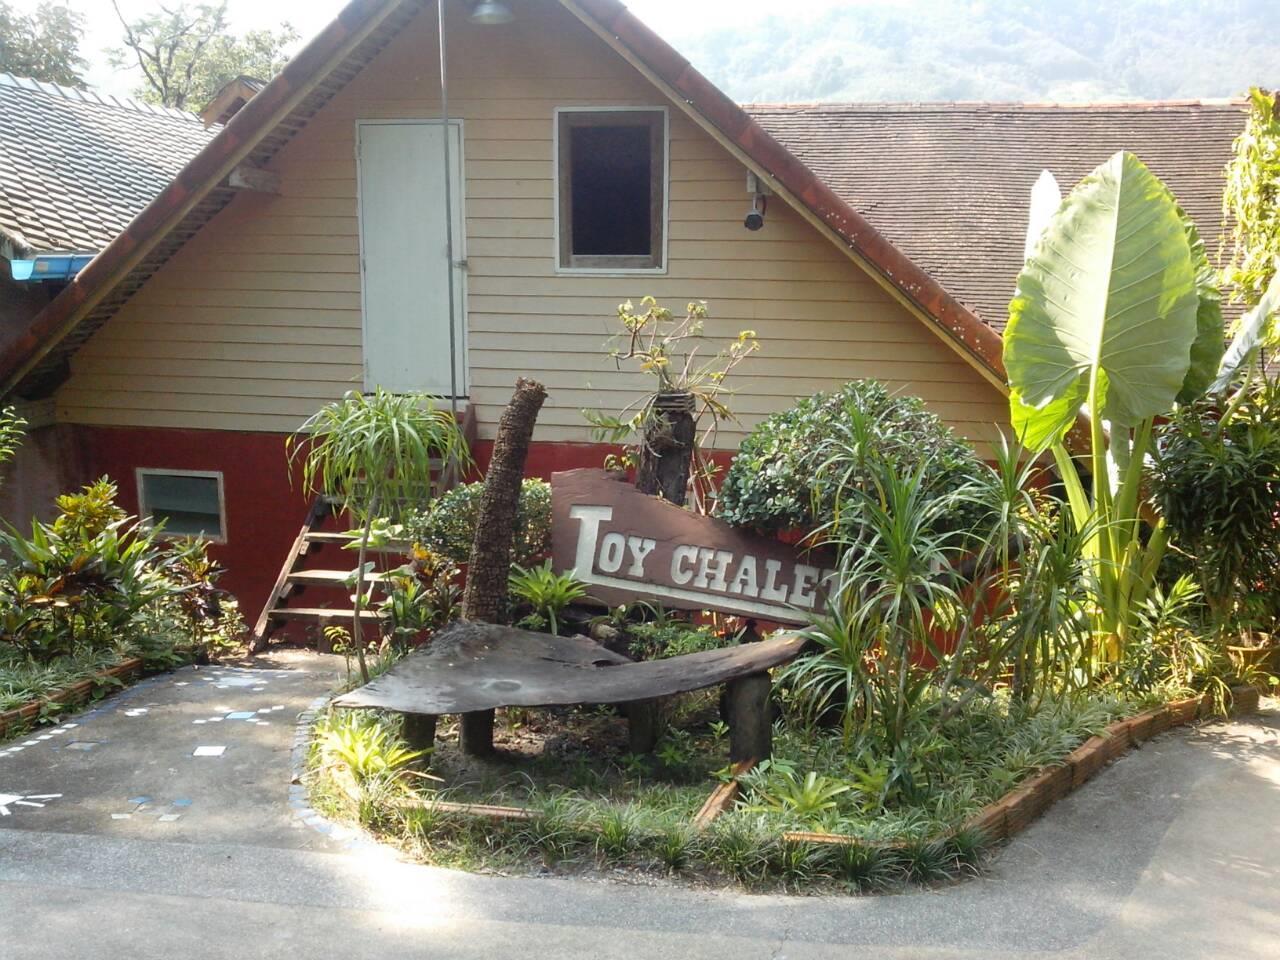 Loy Chalet Resort